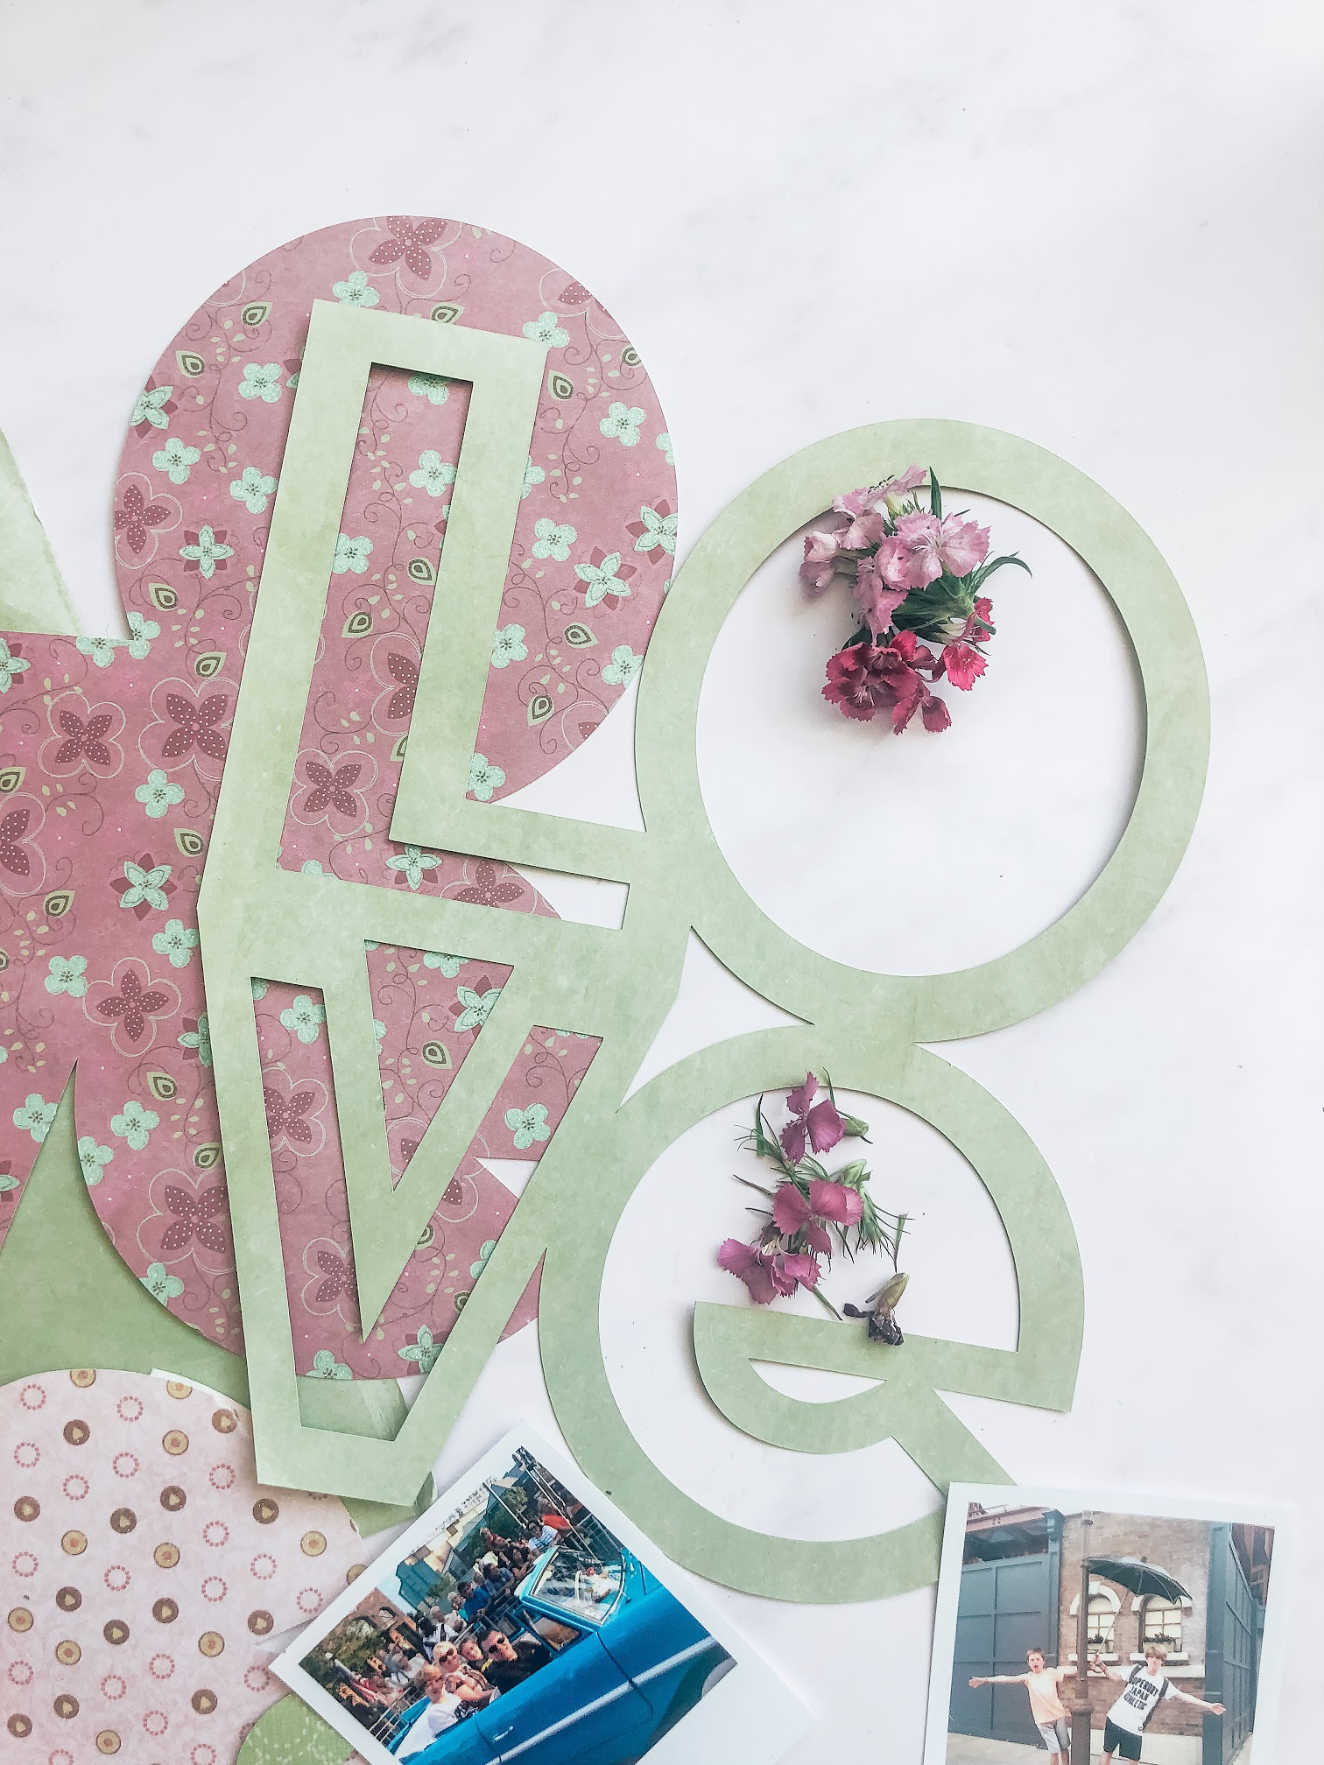 Love Scrapbook layout ideas